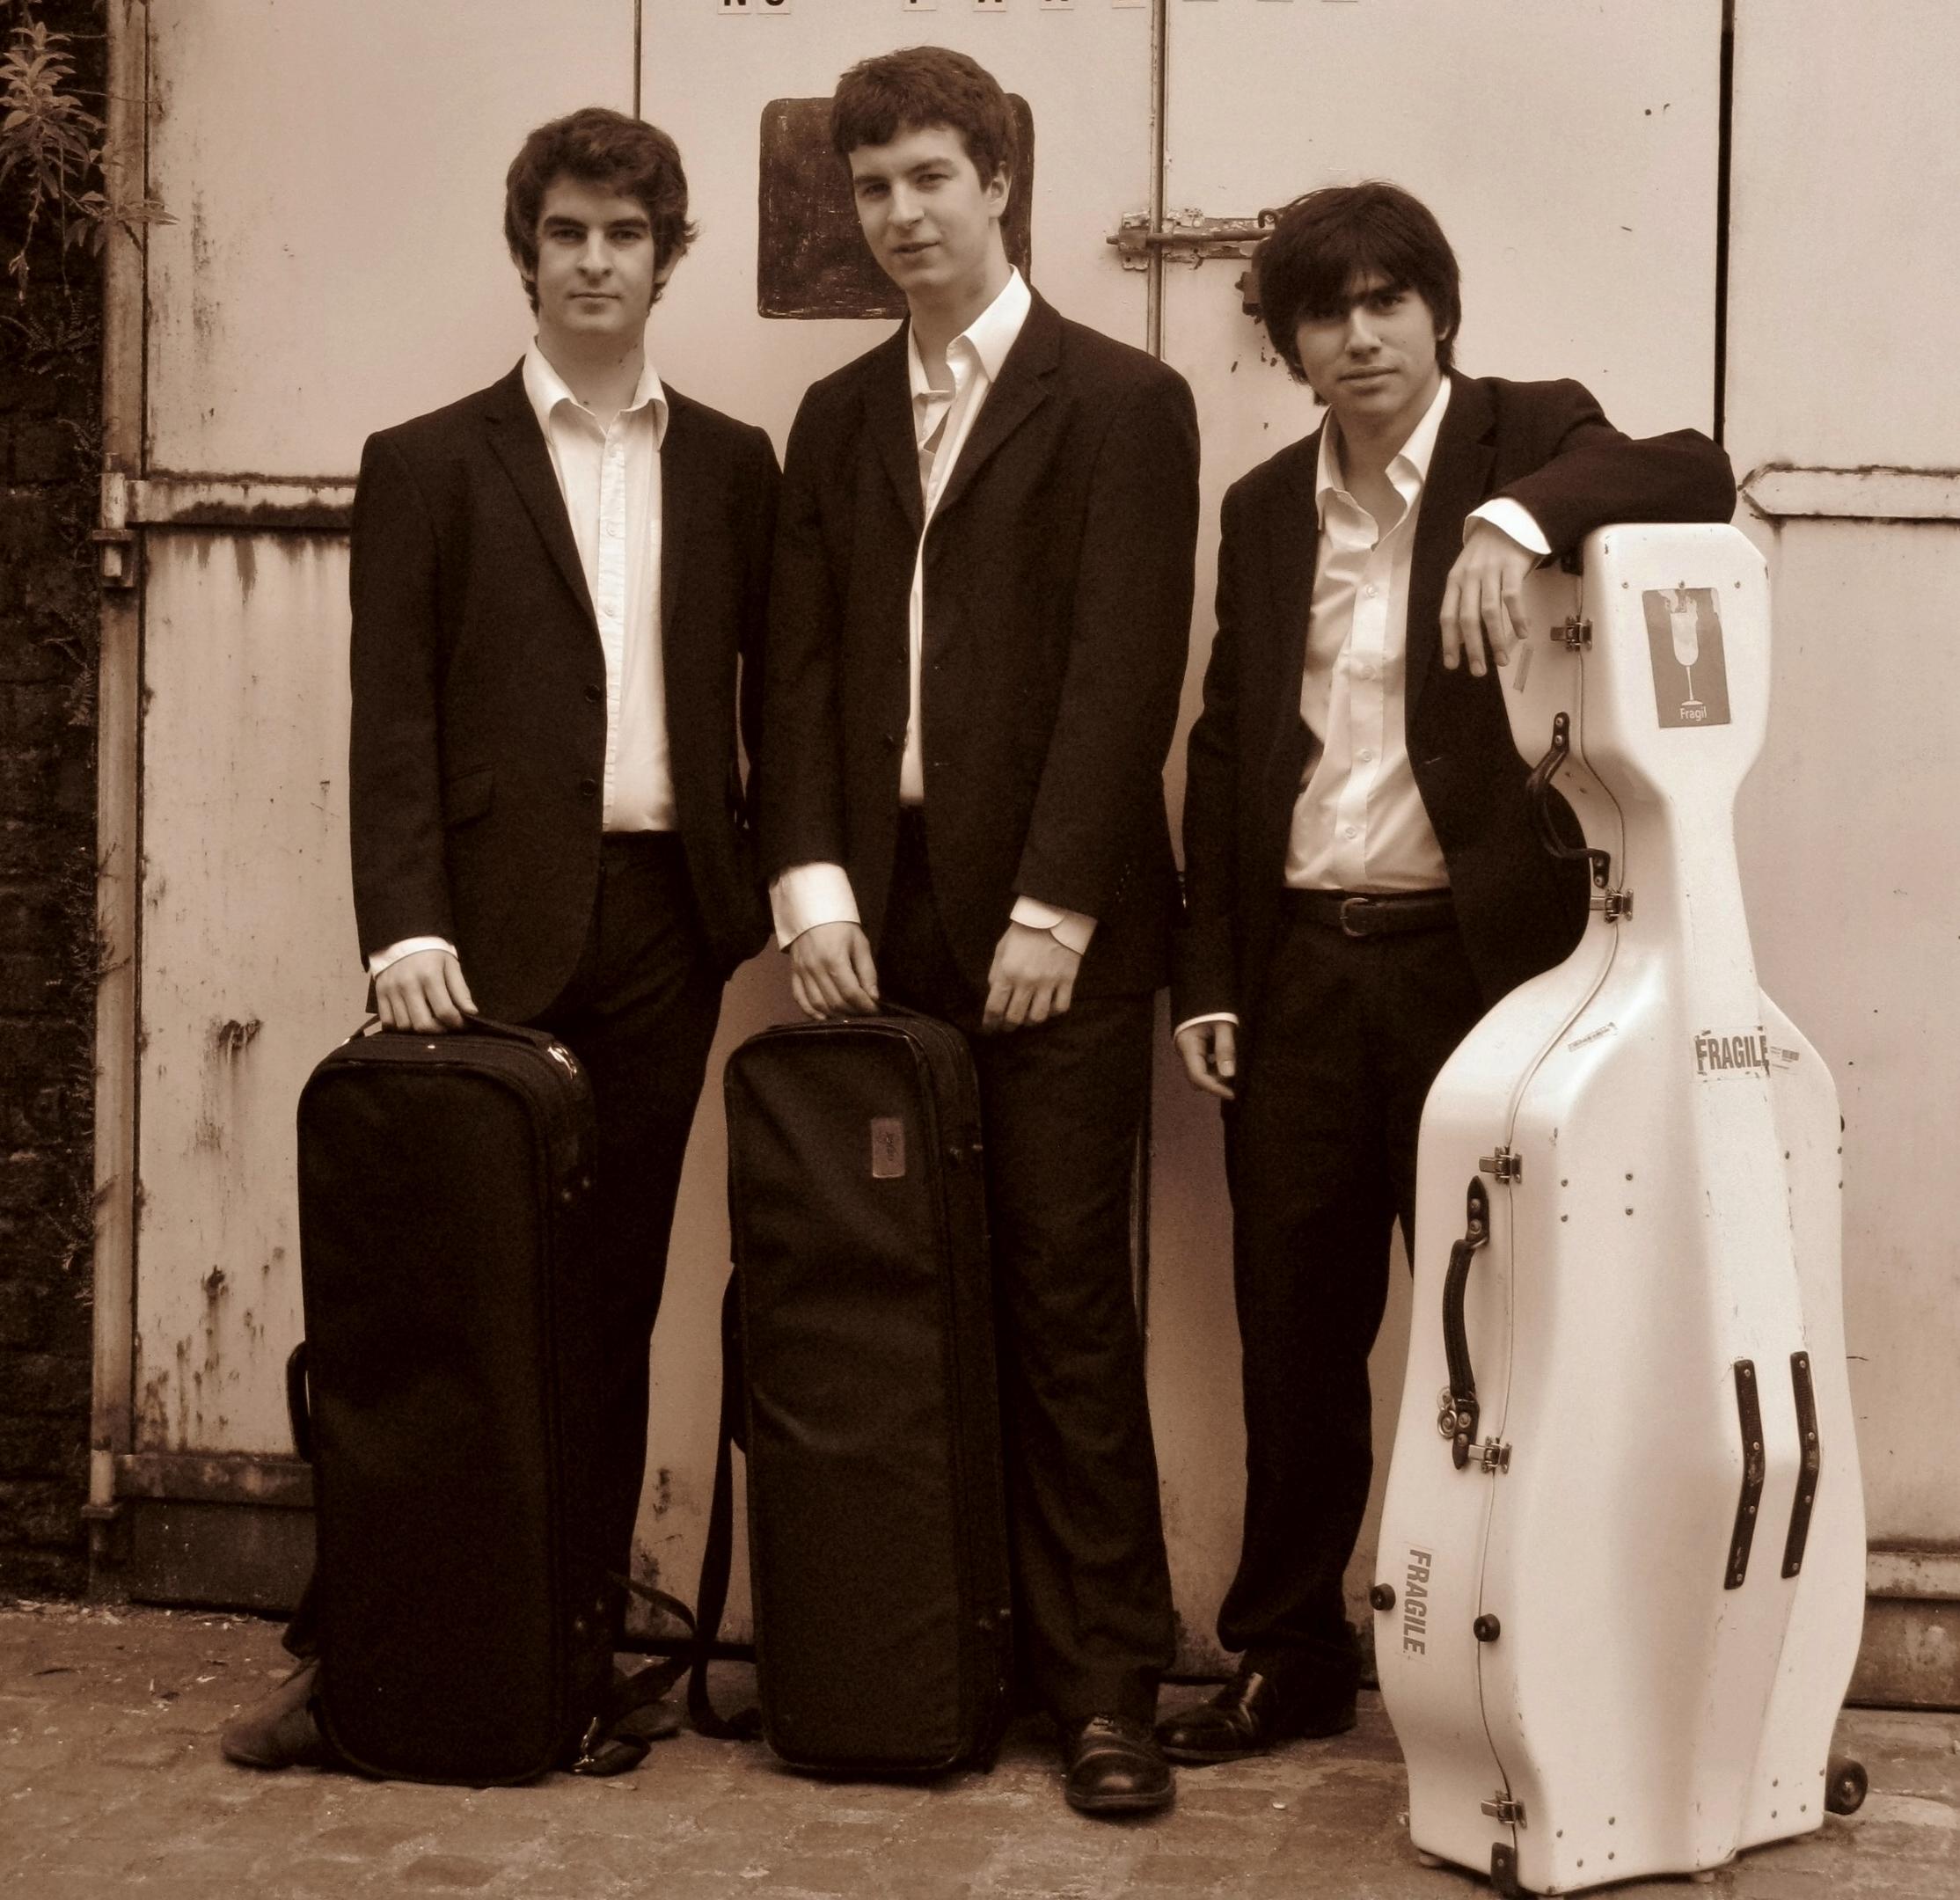 the Perks Ensemble